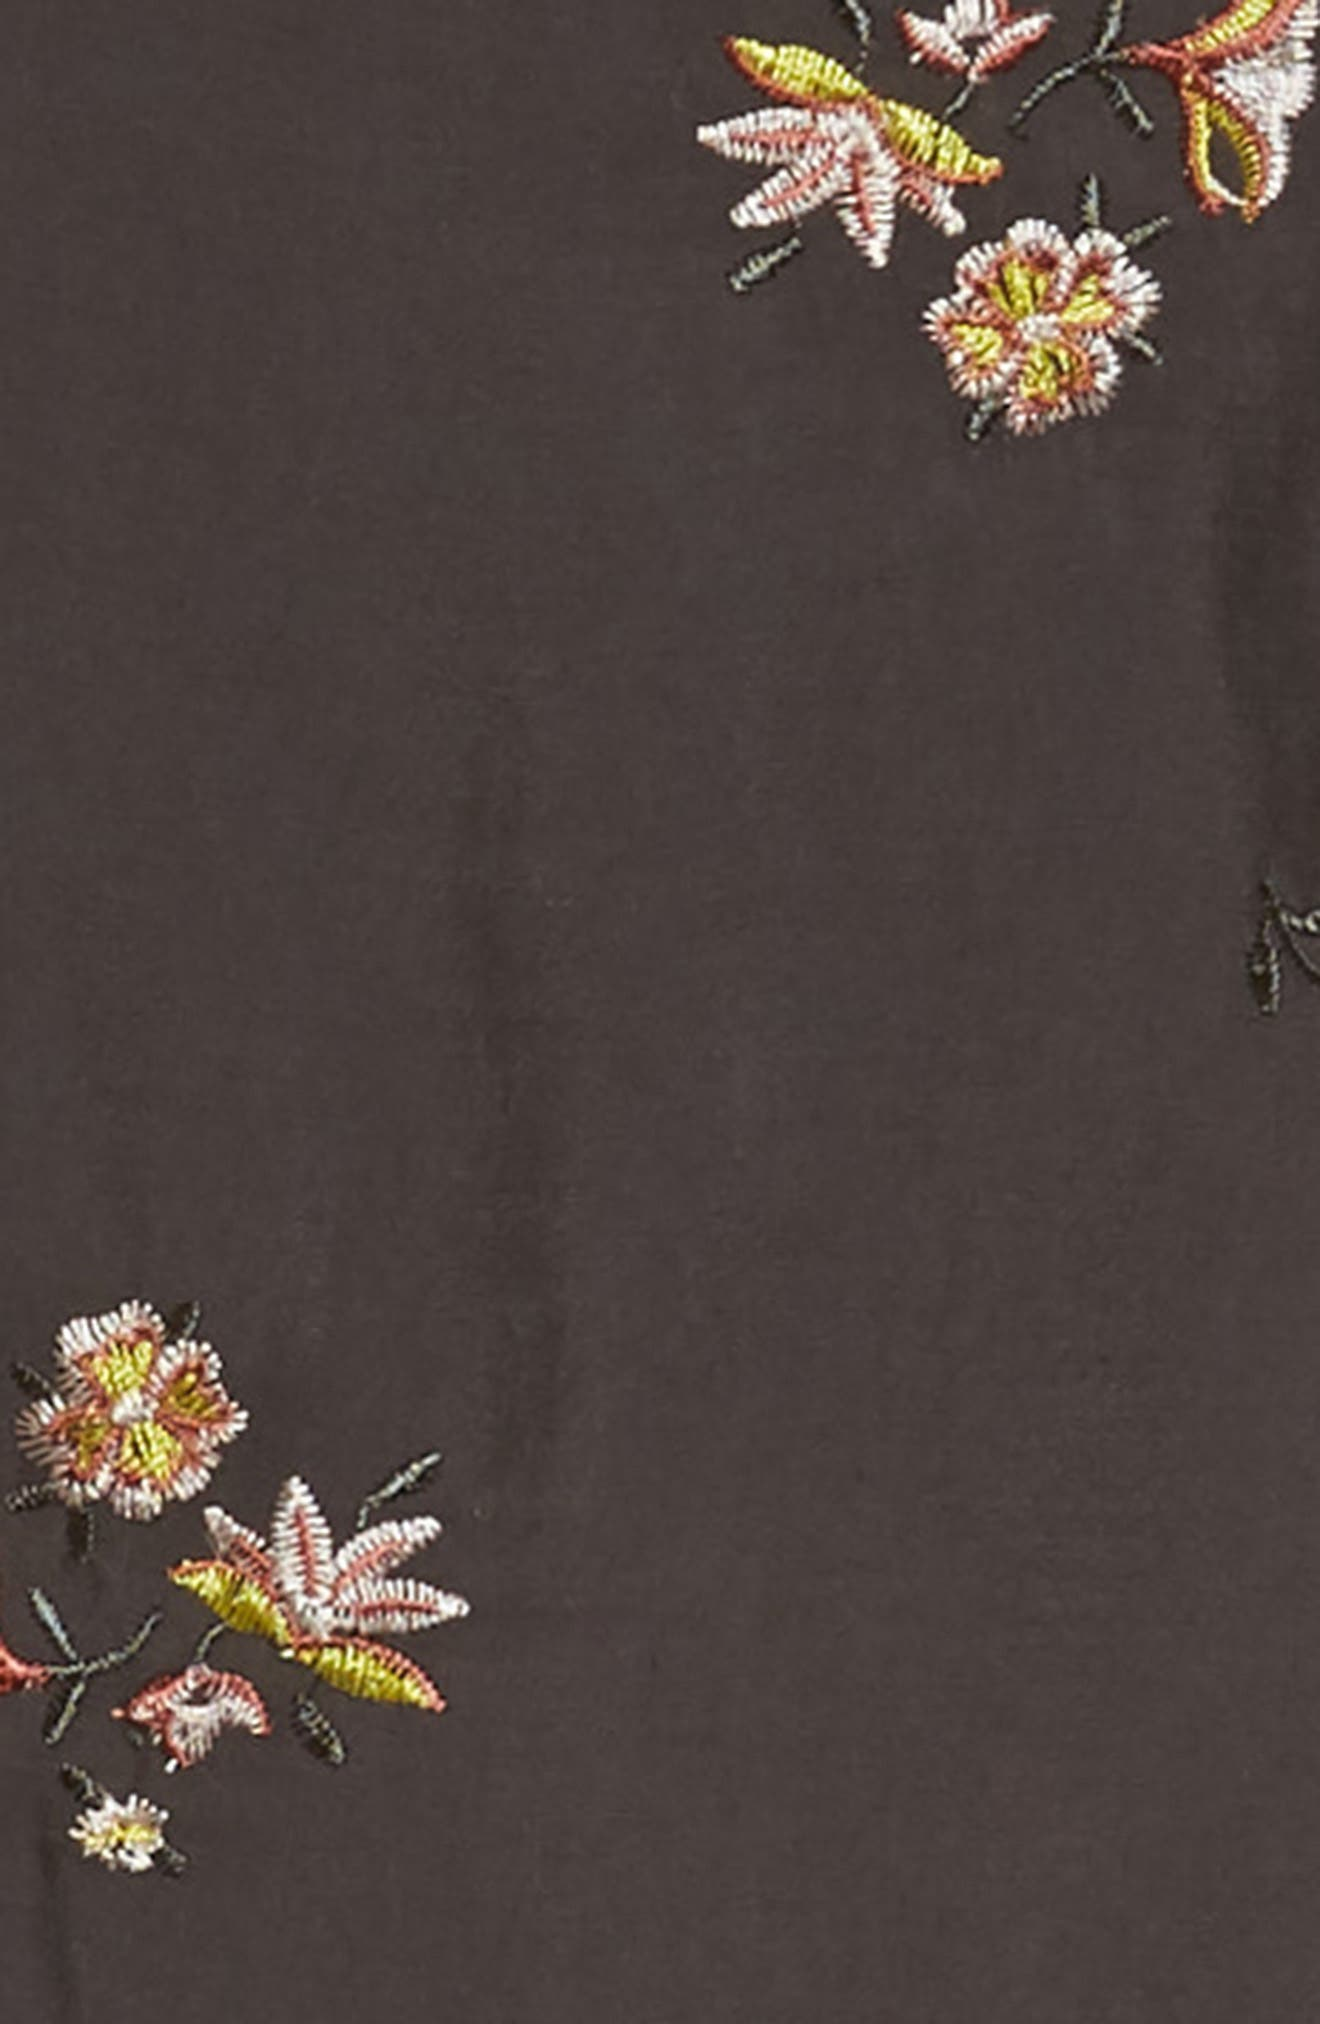 Floral Embroidered Shift Dress,                             Alternate thumbnail 3, color,                             Black Raven Organic Floral